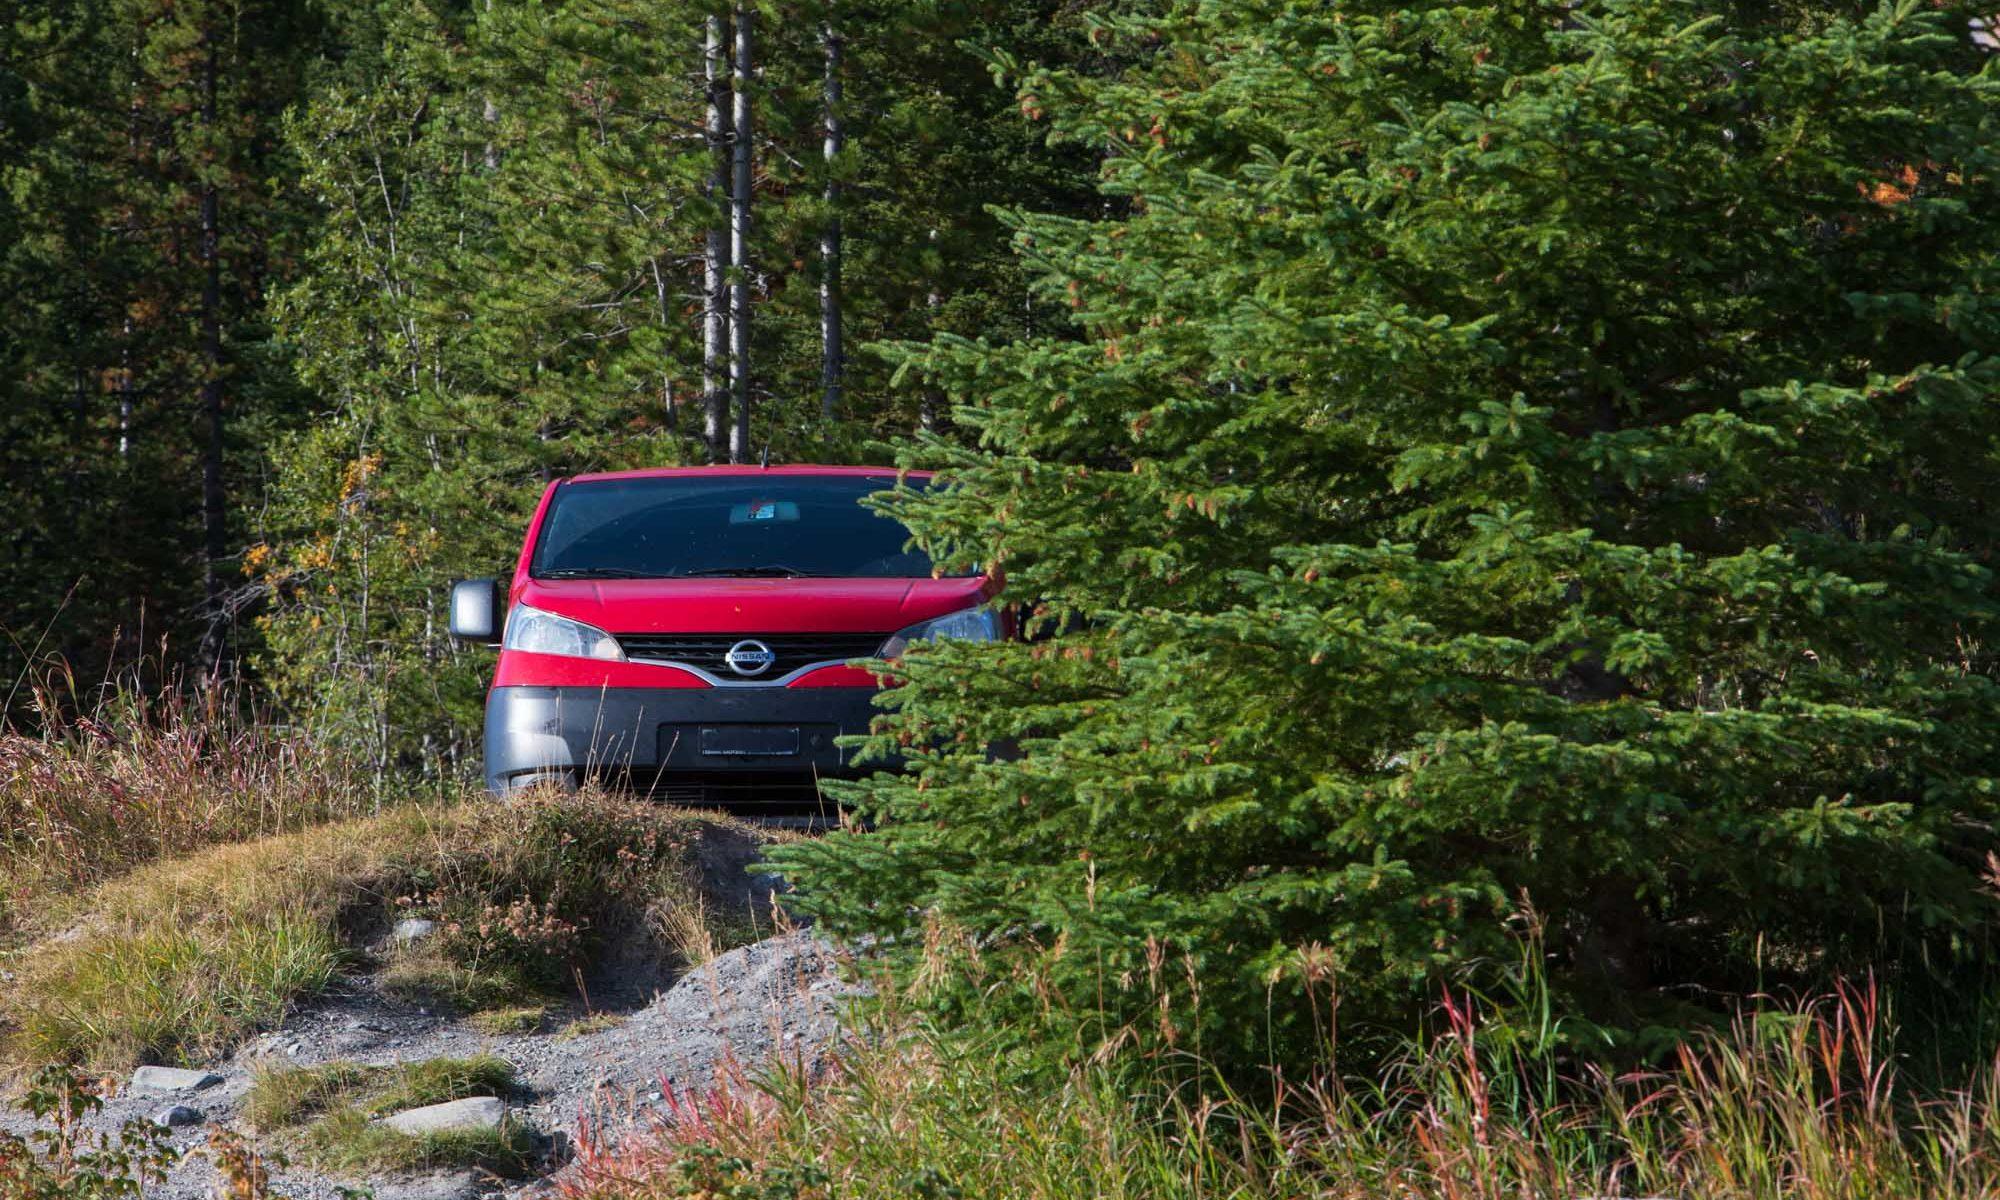 Roter Campervan hinter Bäumen versteckt.